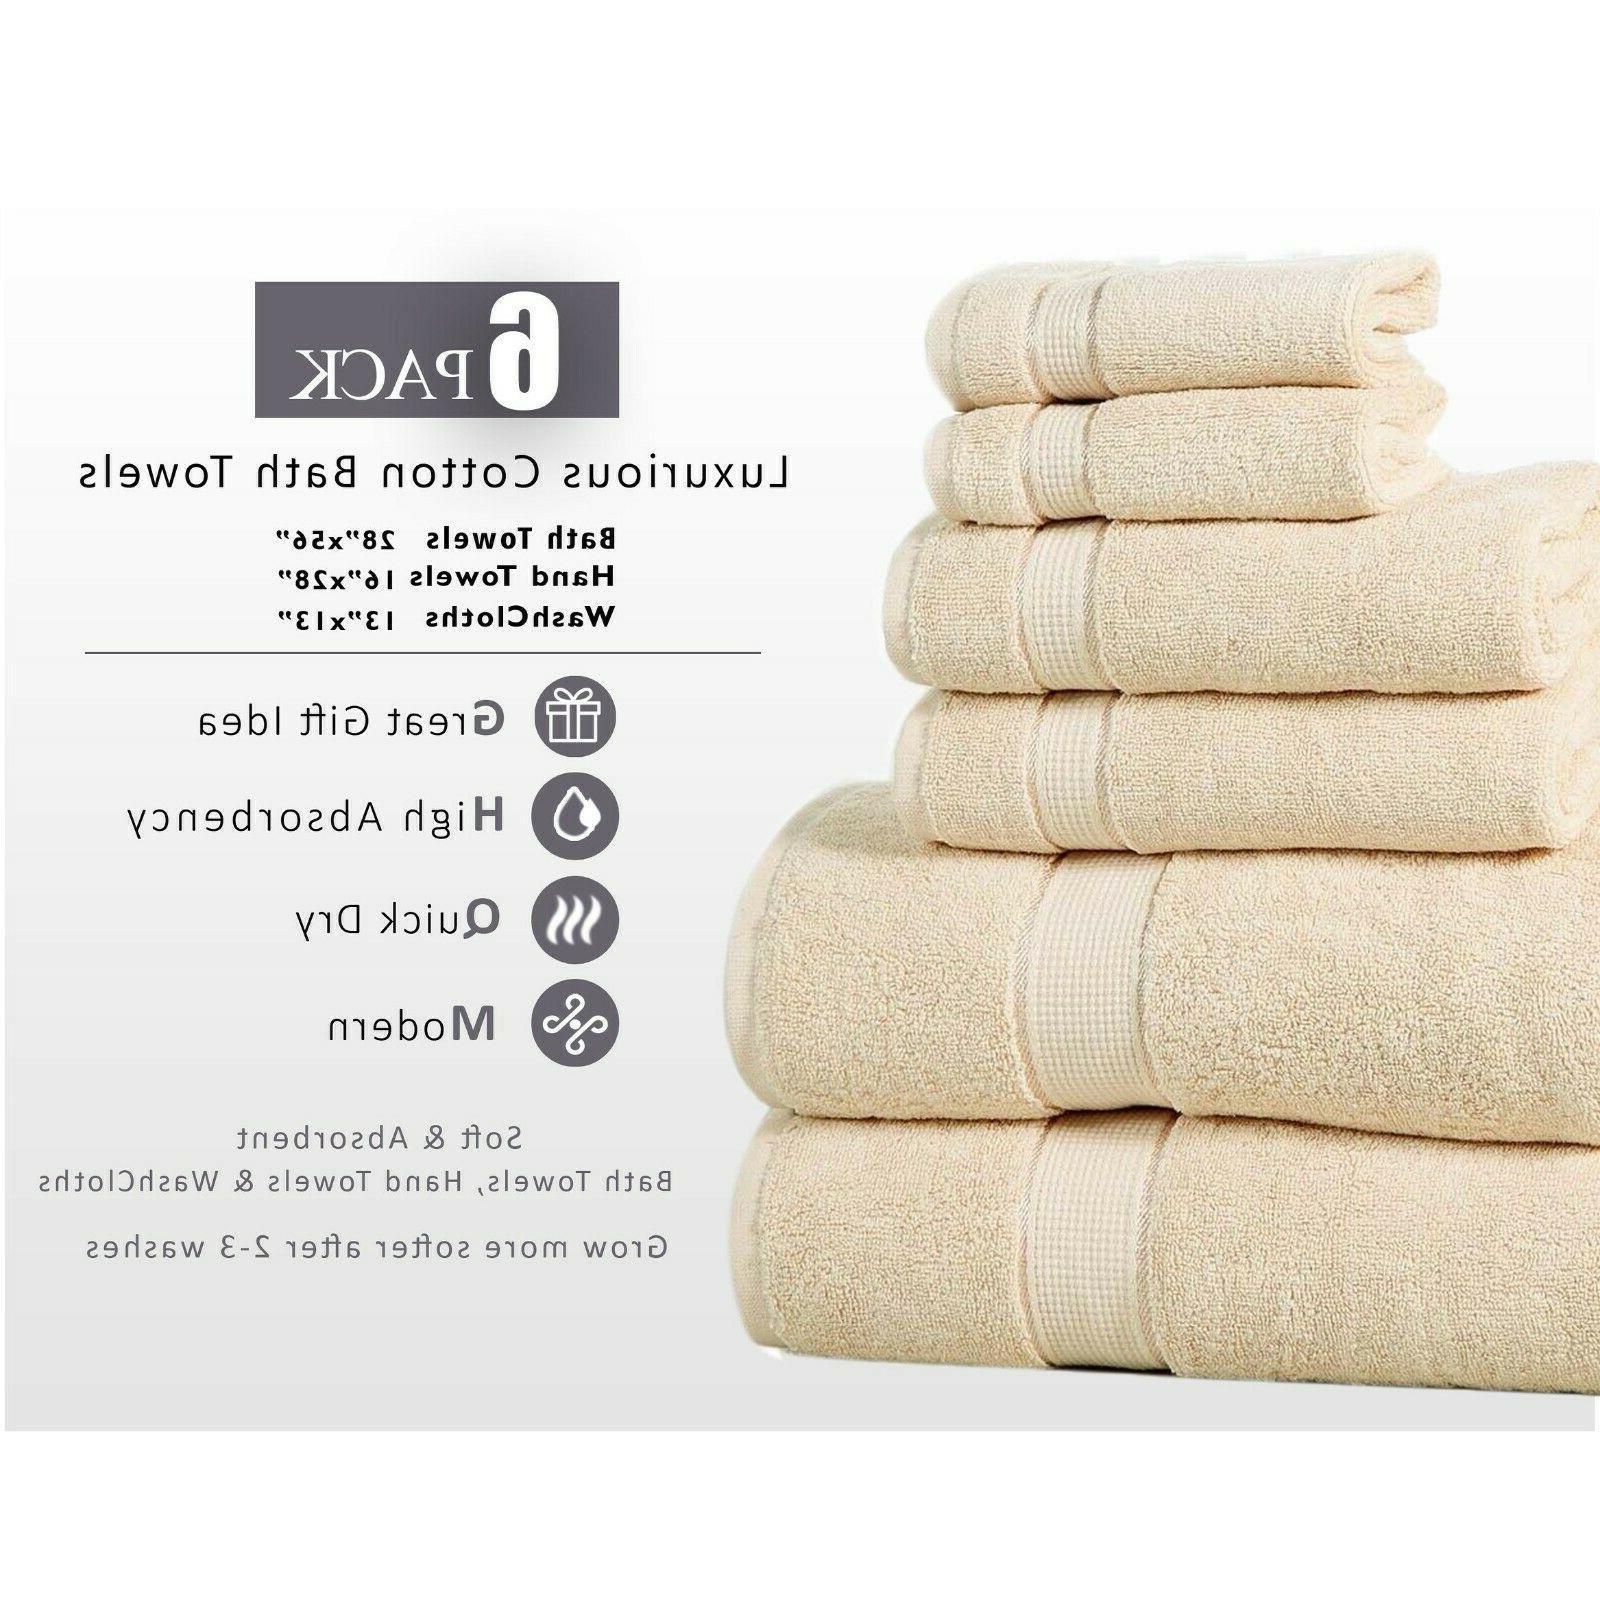 Towel Set 6 Piece Set Cotton 600 GSM- 2 Bath Towel 2 Hand To